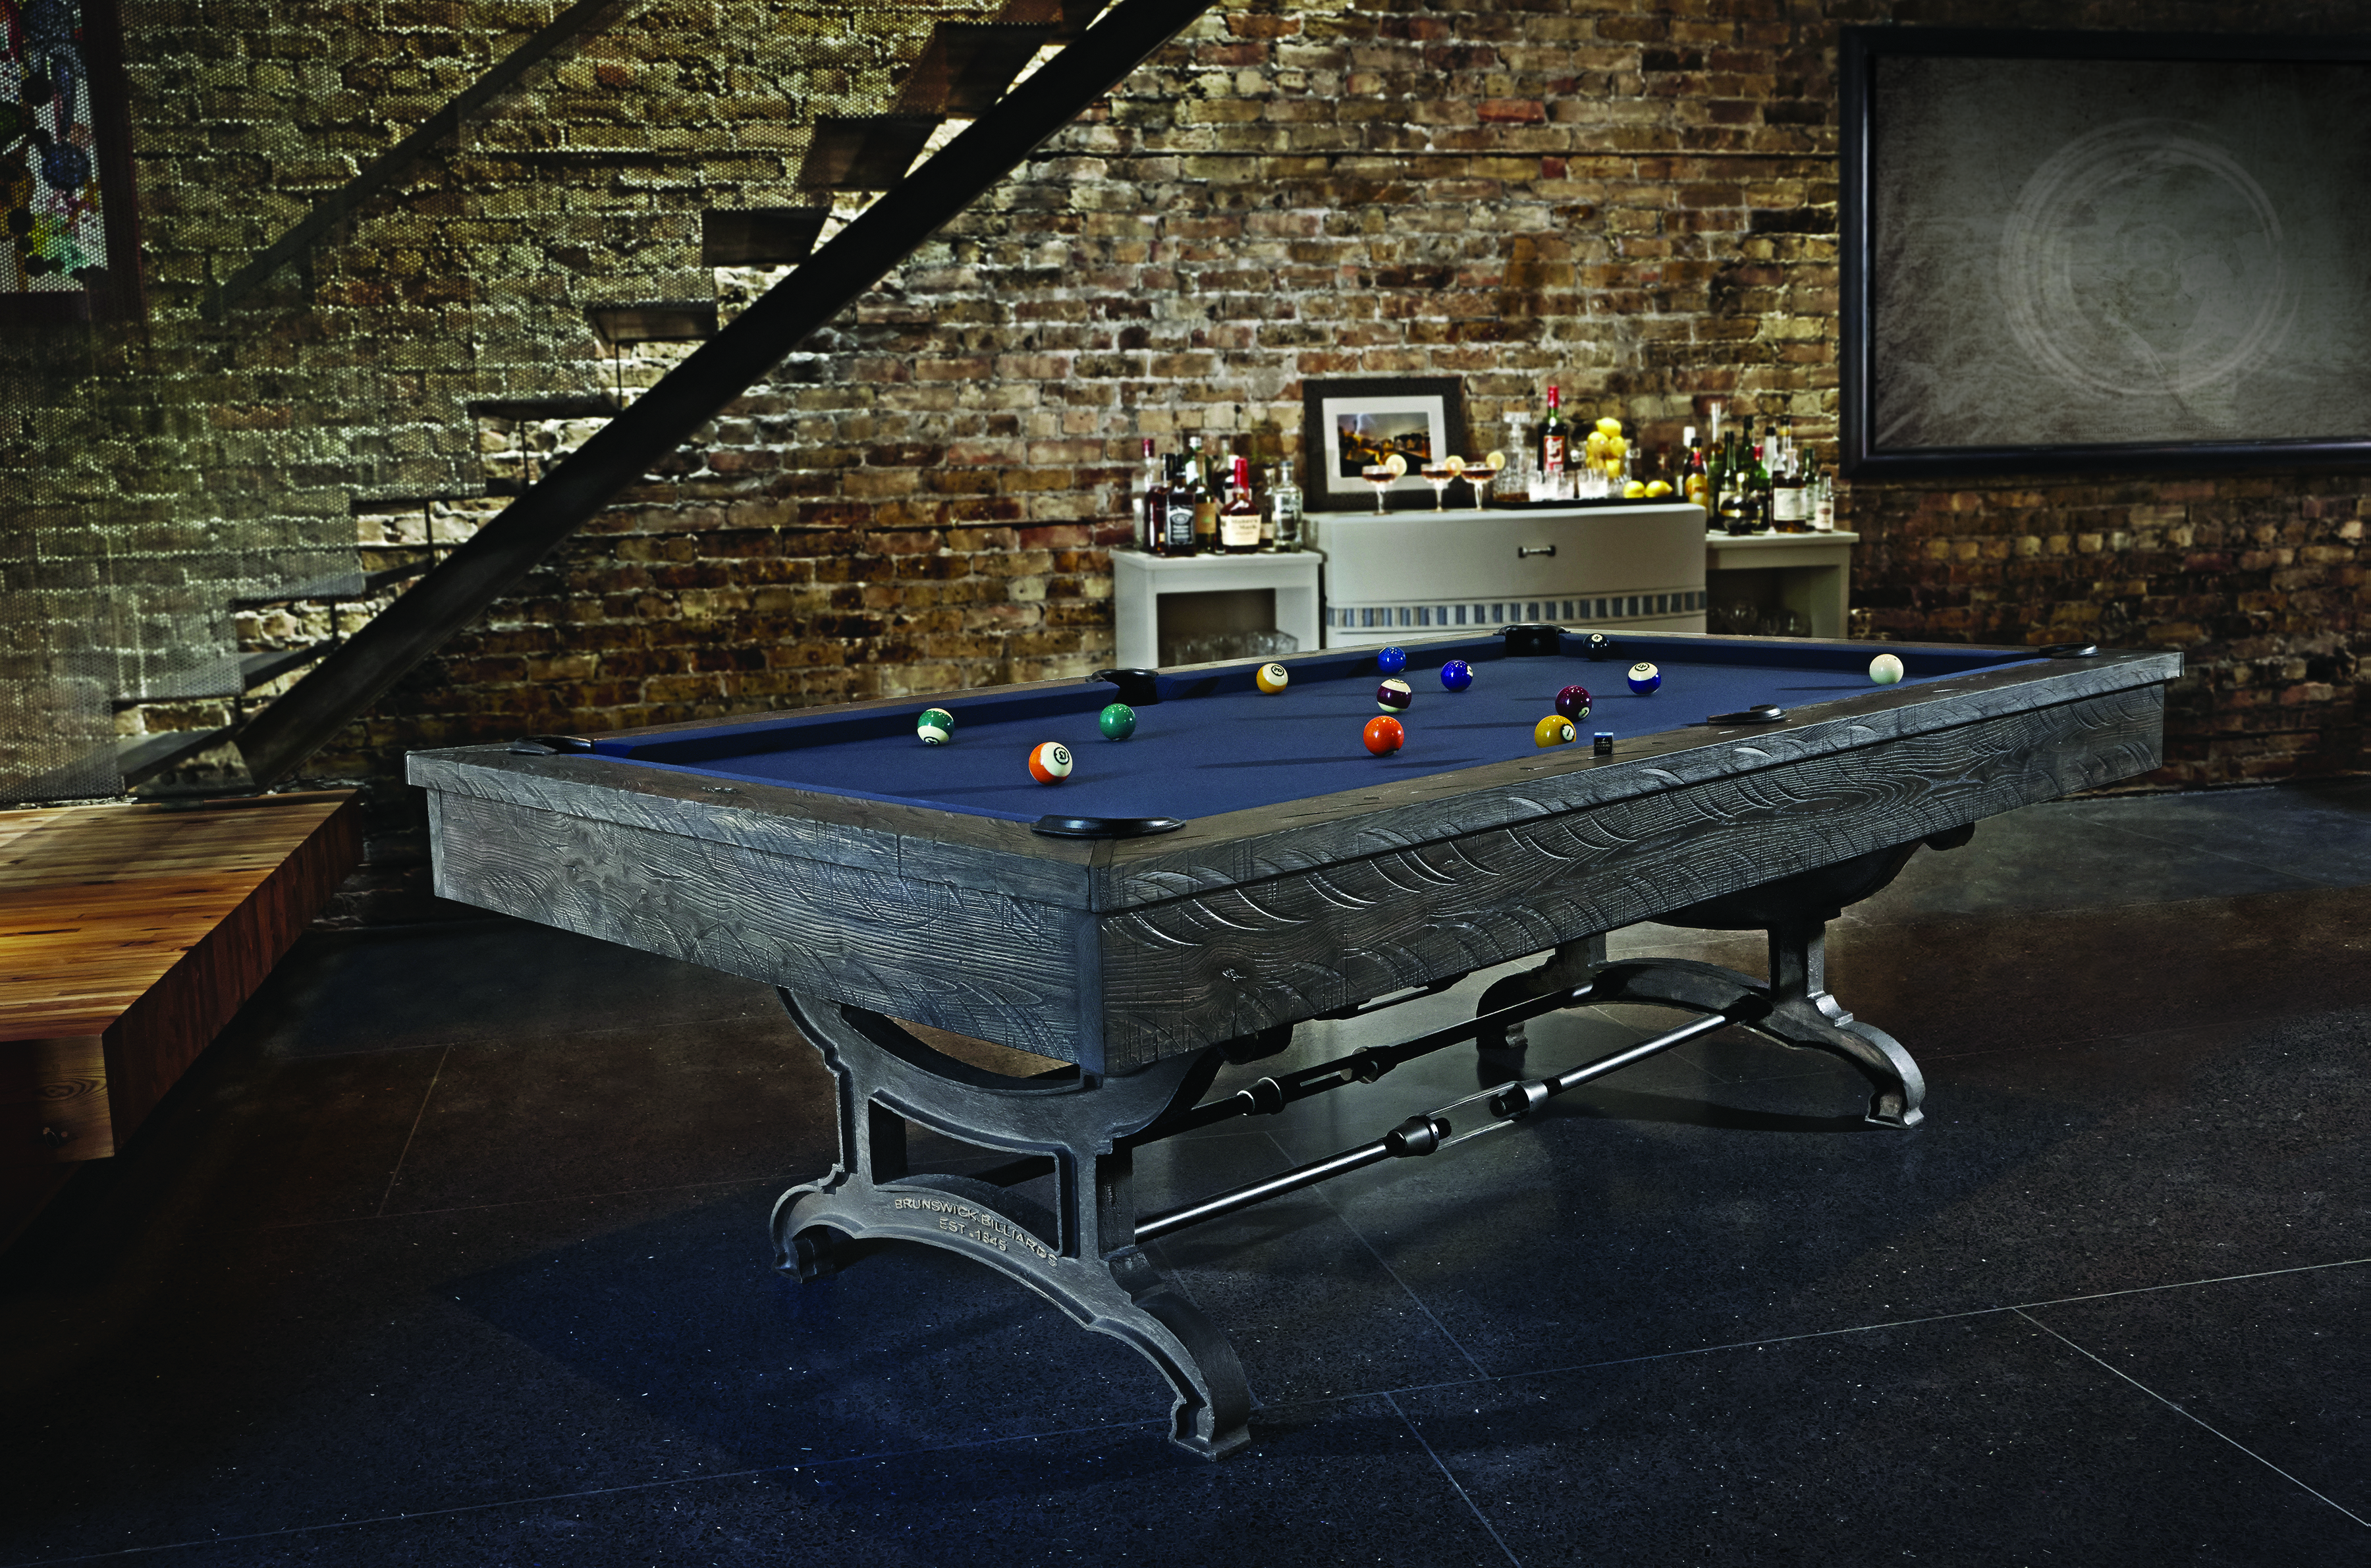 Fine Marker For Marking Pool Snooker Billiard Table Cloth - Mr billiards pool table